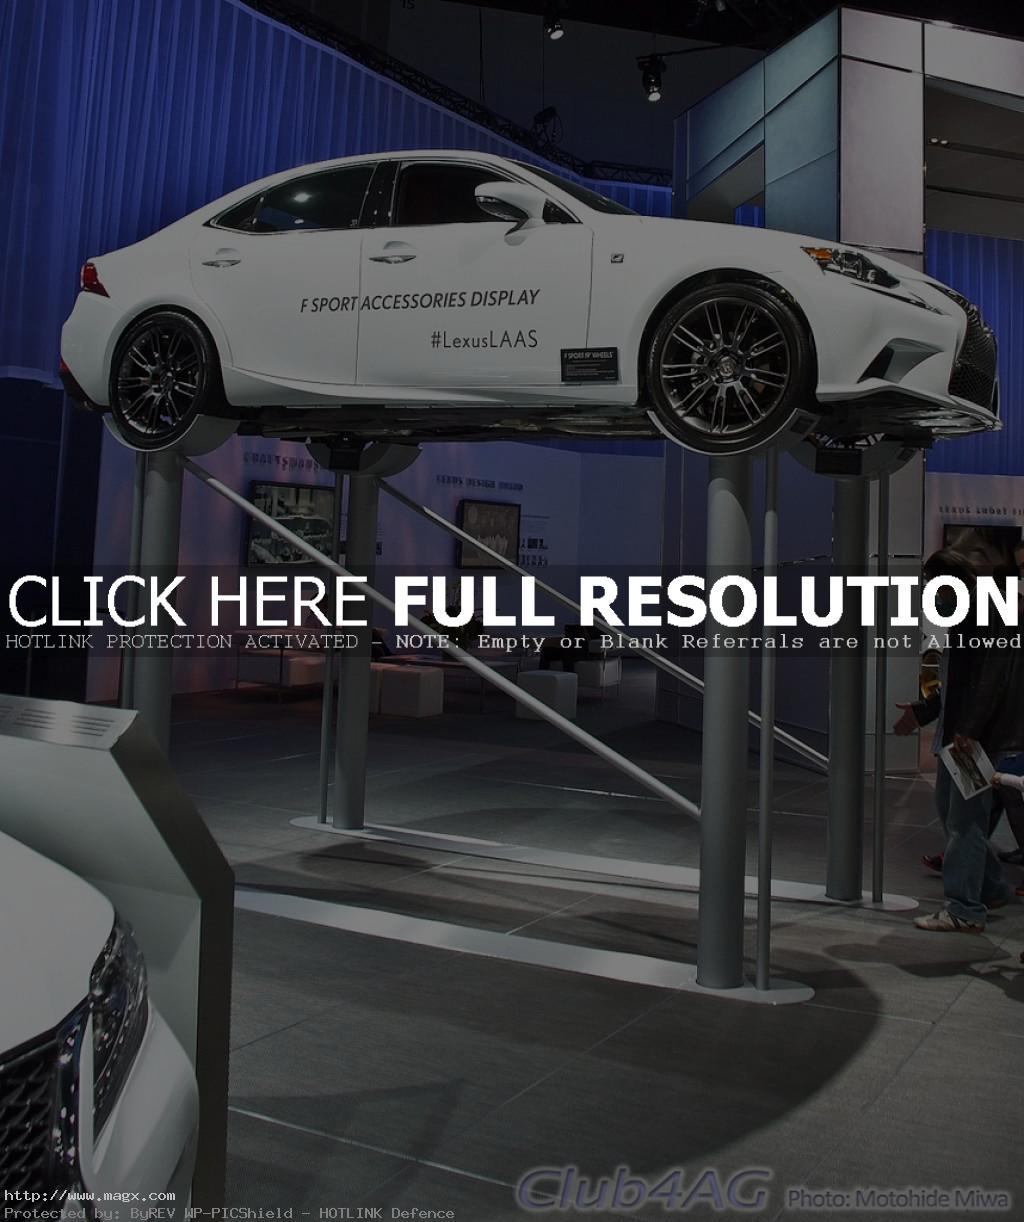 los angeles auto show3 Los Angeles Auto Show 2013